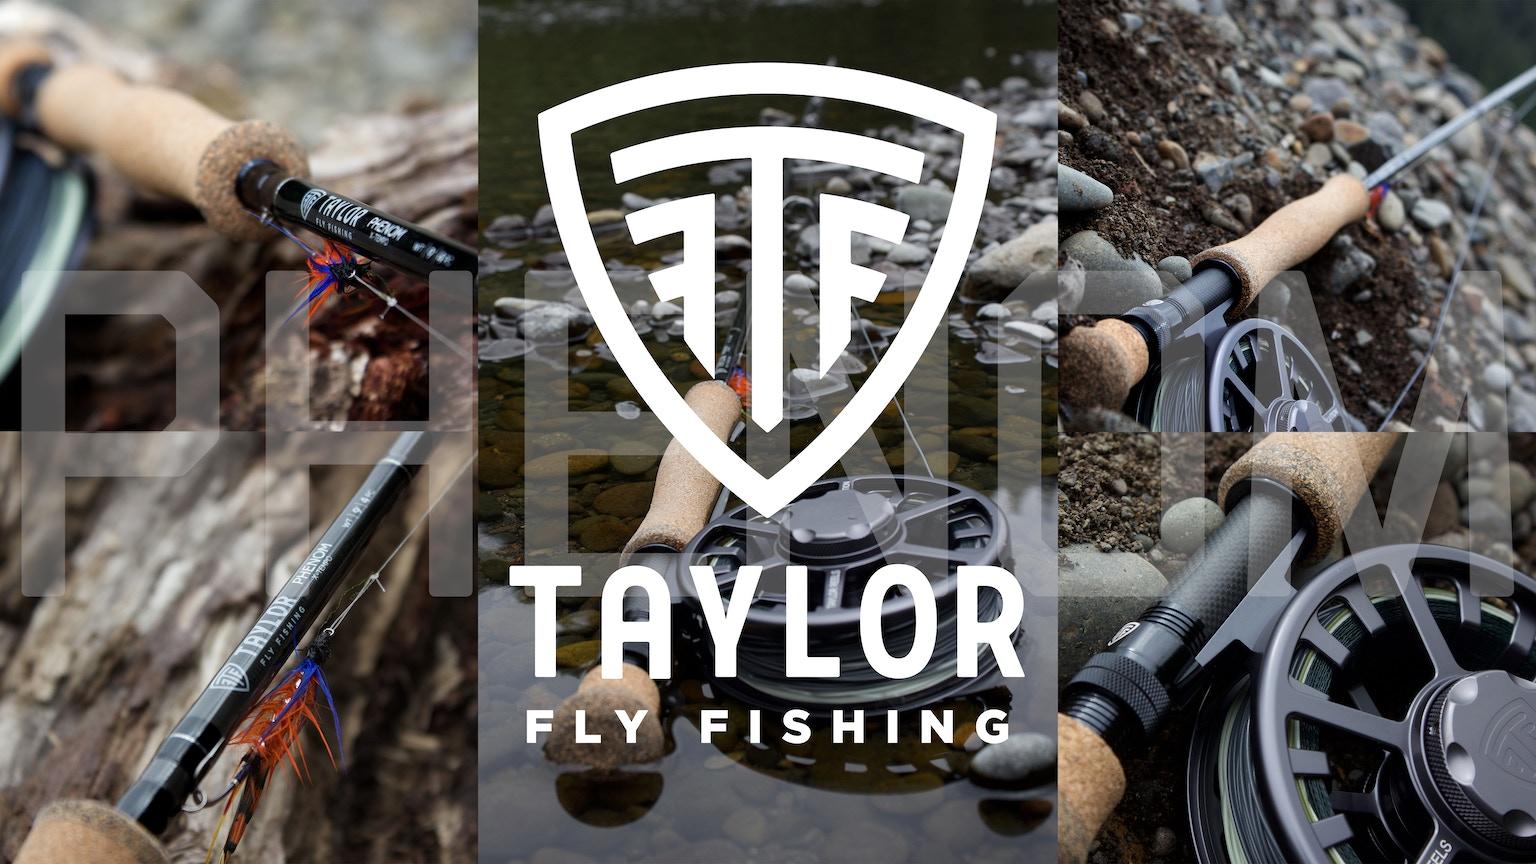 Taylor fly fishing rod phenom by matthew bork taylor for Taylor fly fishing